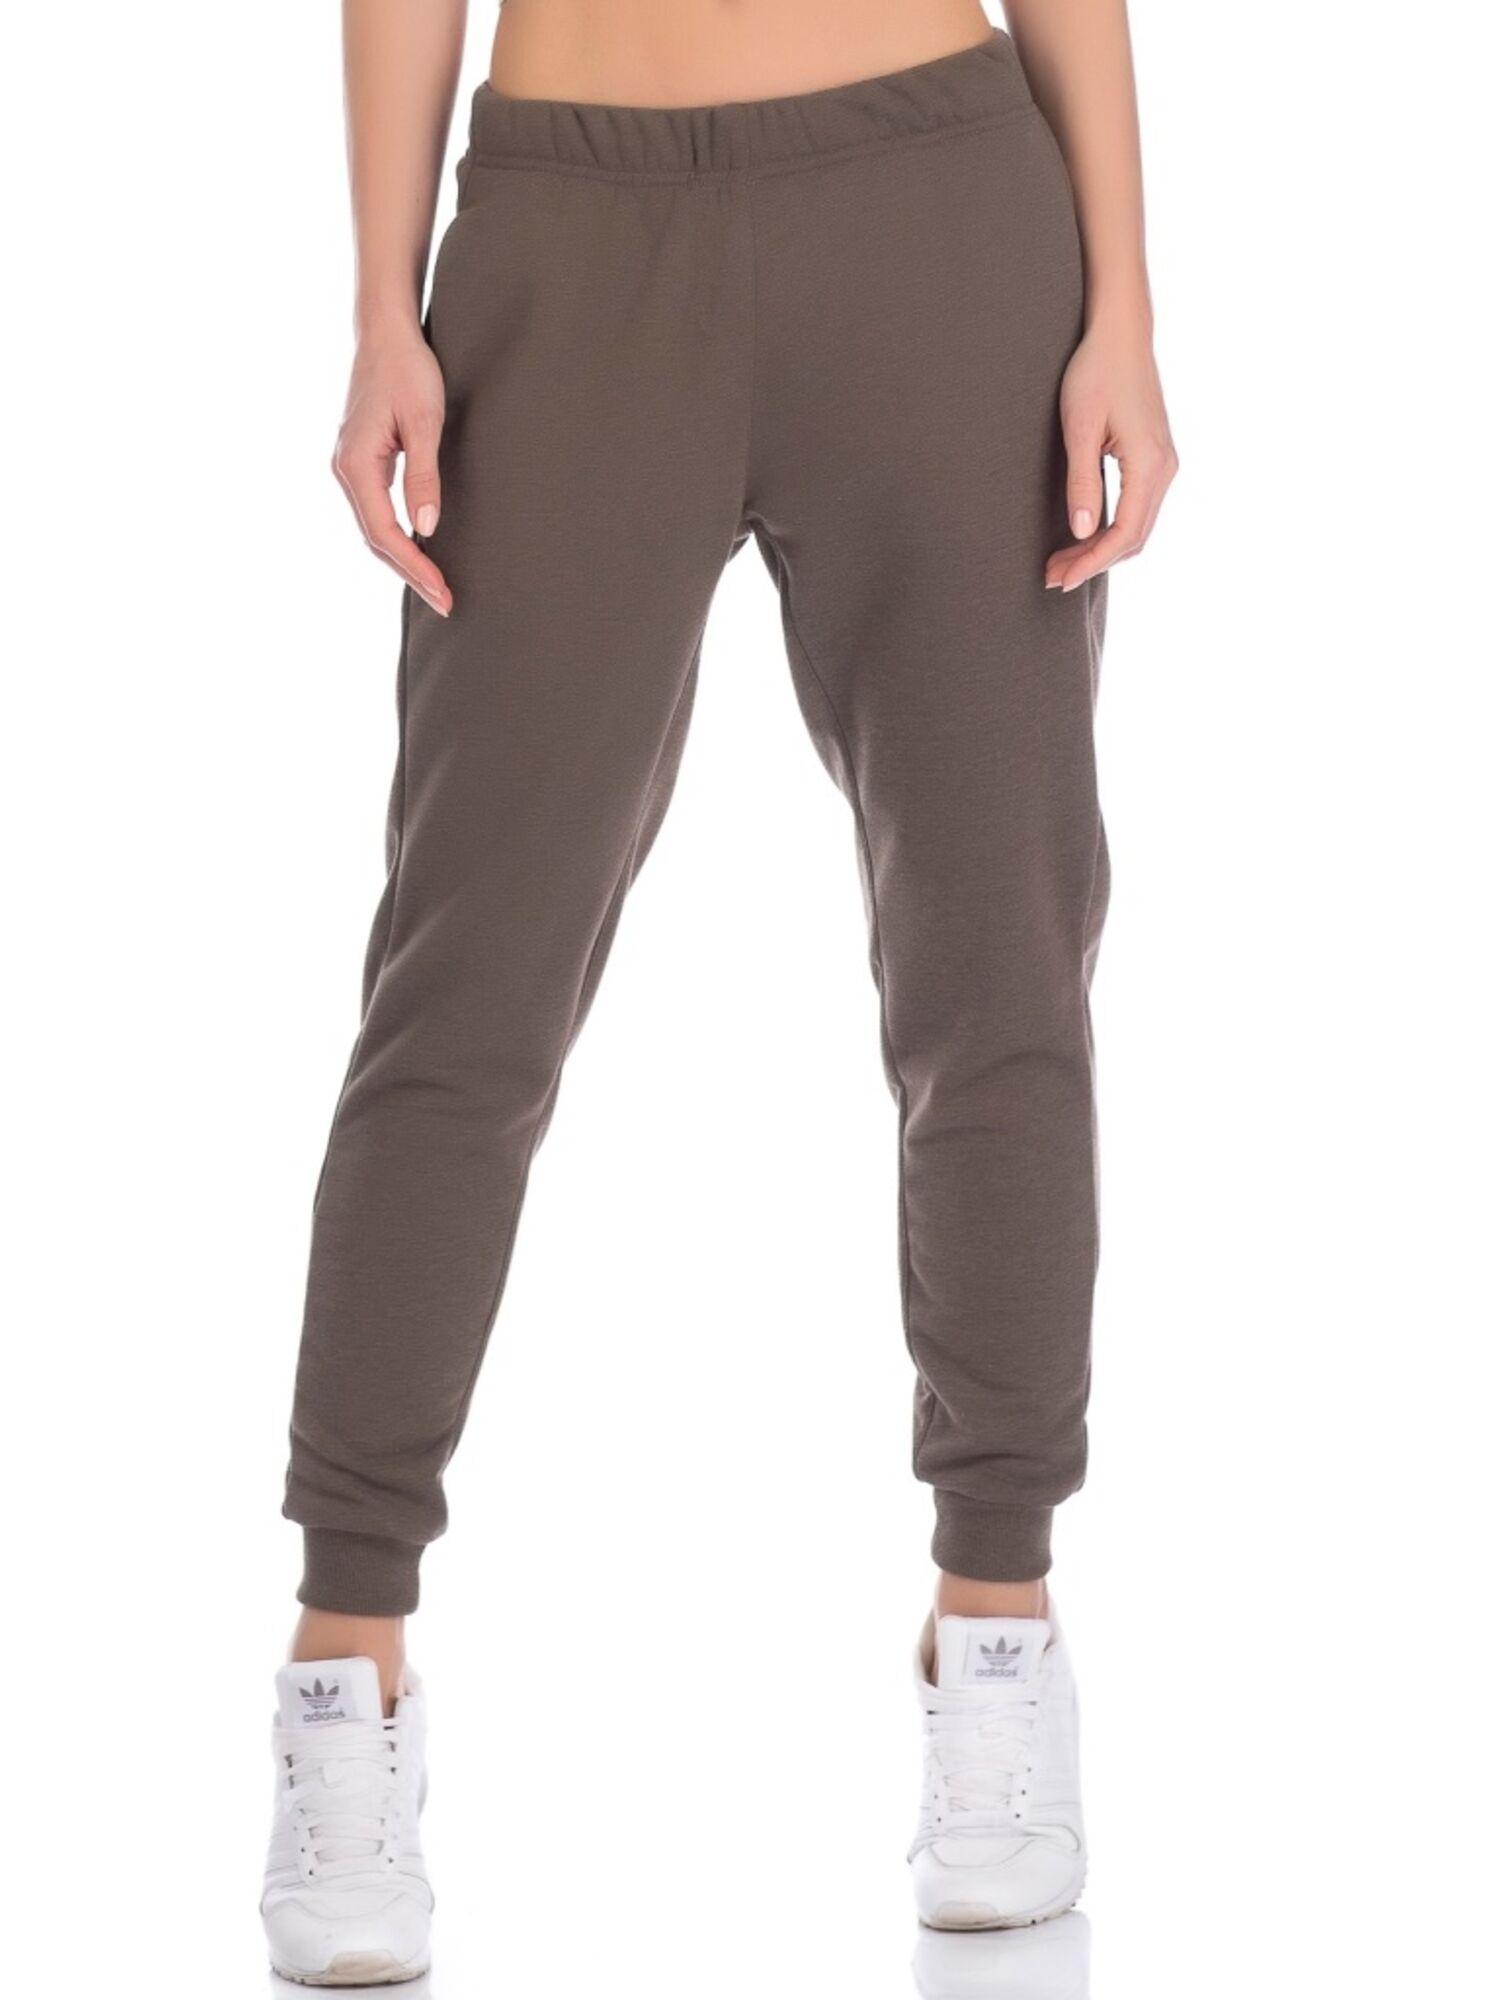 Женские спортивные брюки 1700 Wake & Up темно-бежевый, Peche Monnaie (Россия)